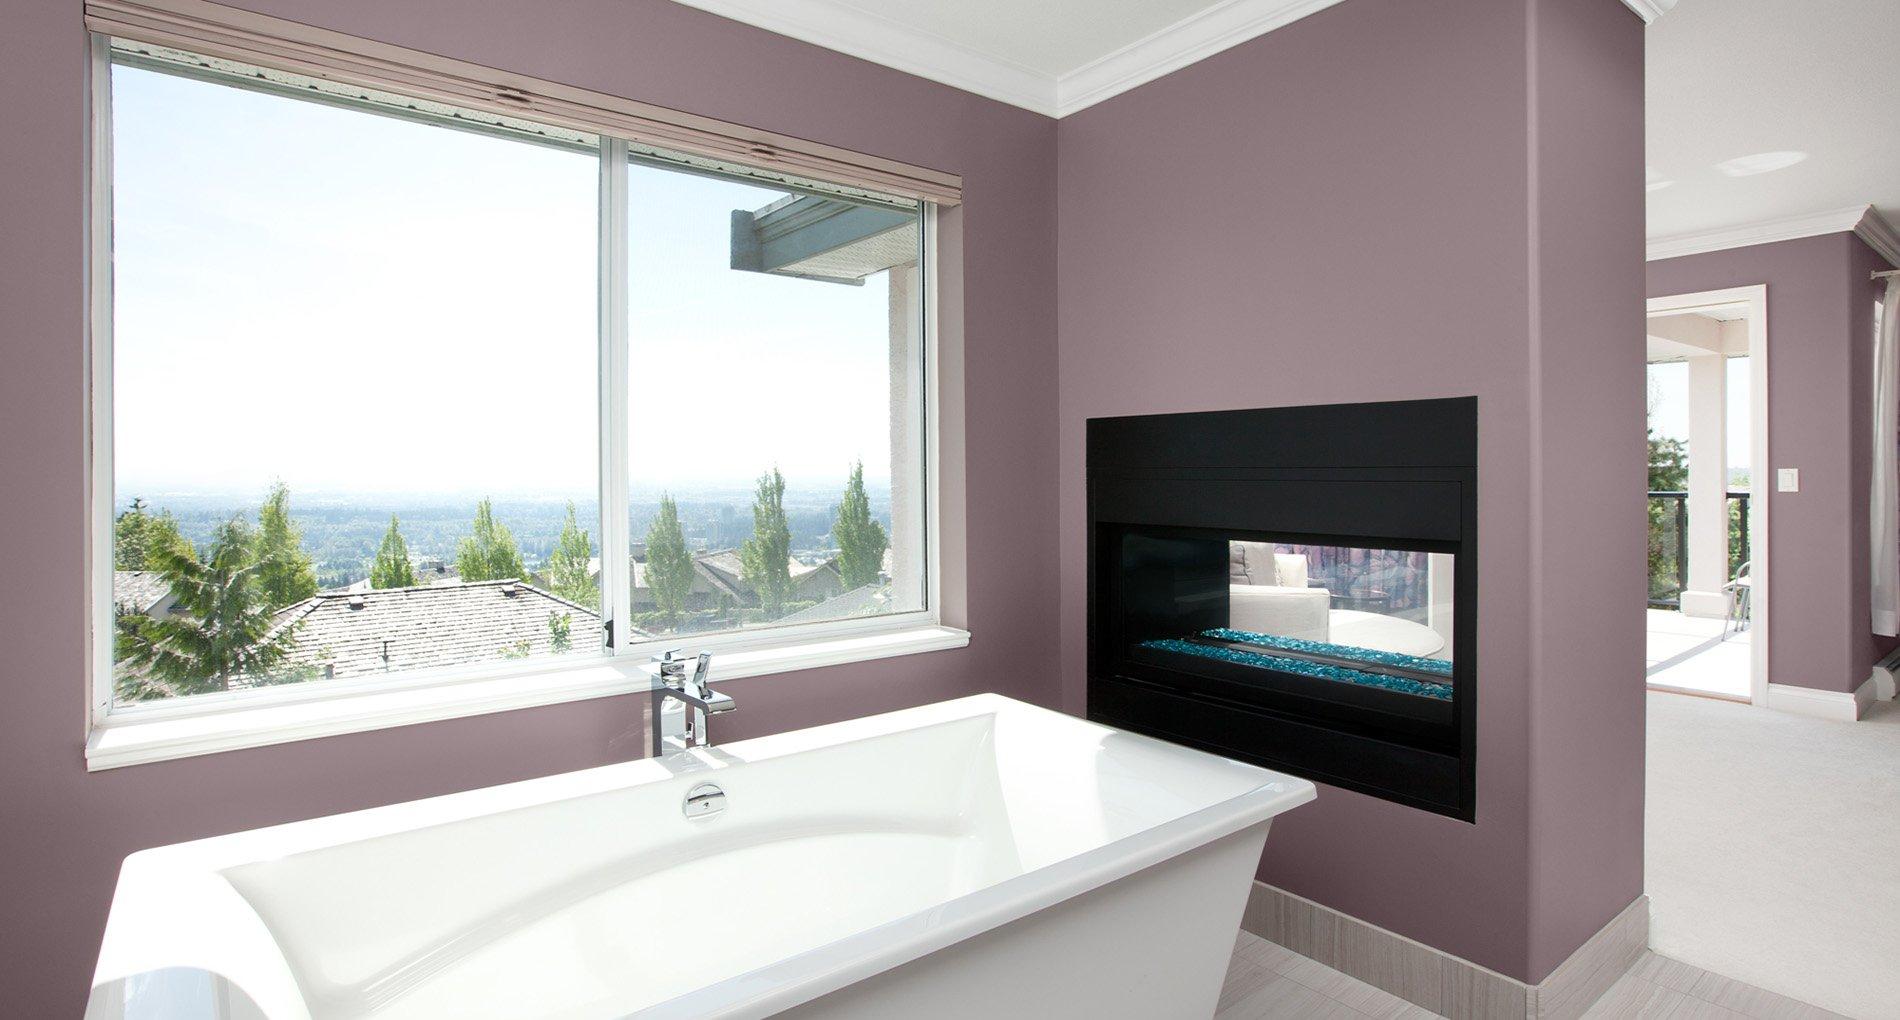 Coquitlam Bathroom Renovation